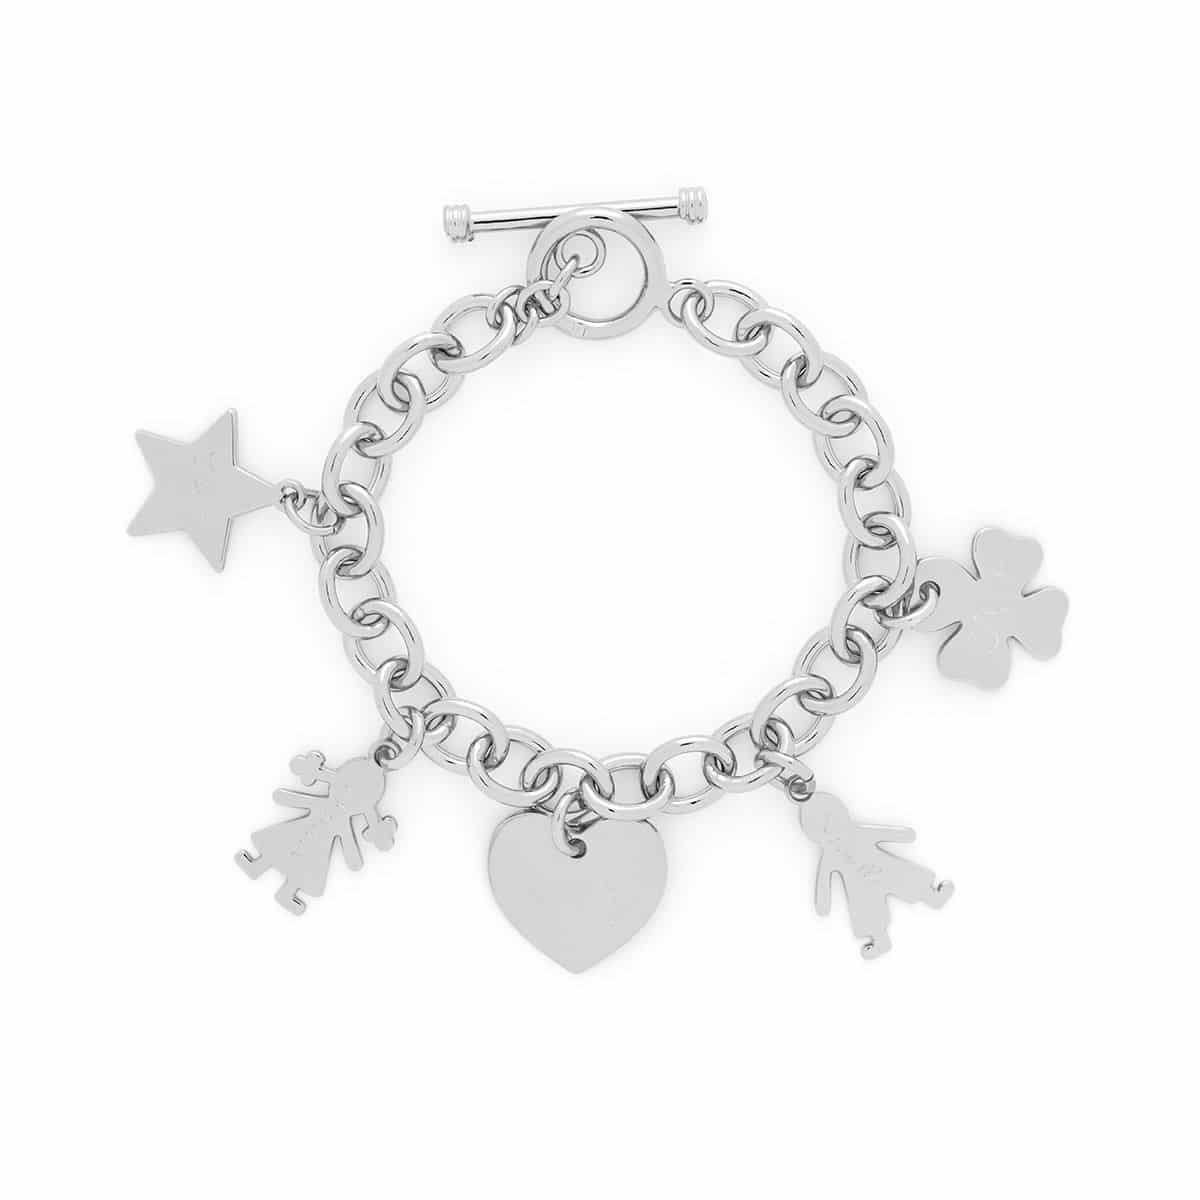 Bracelet chaine bijou Atelier de Famille